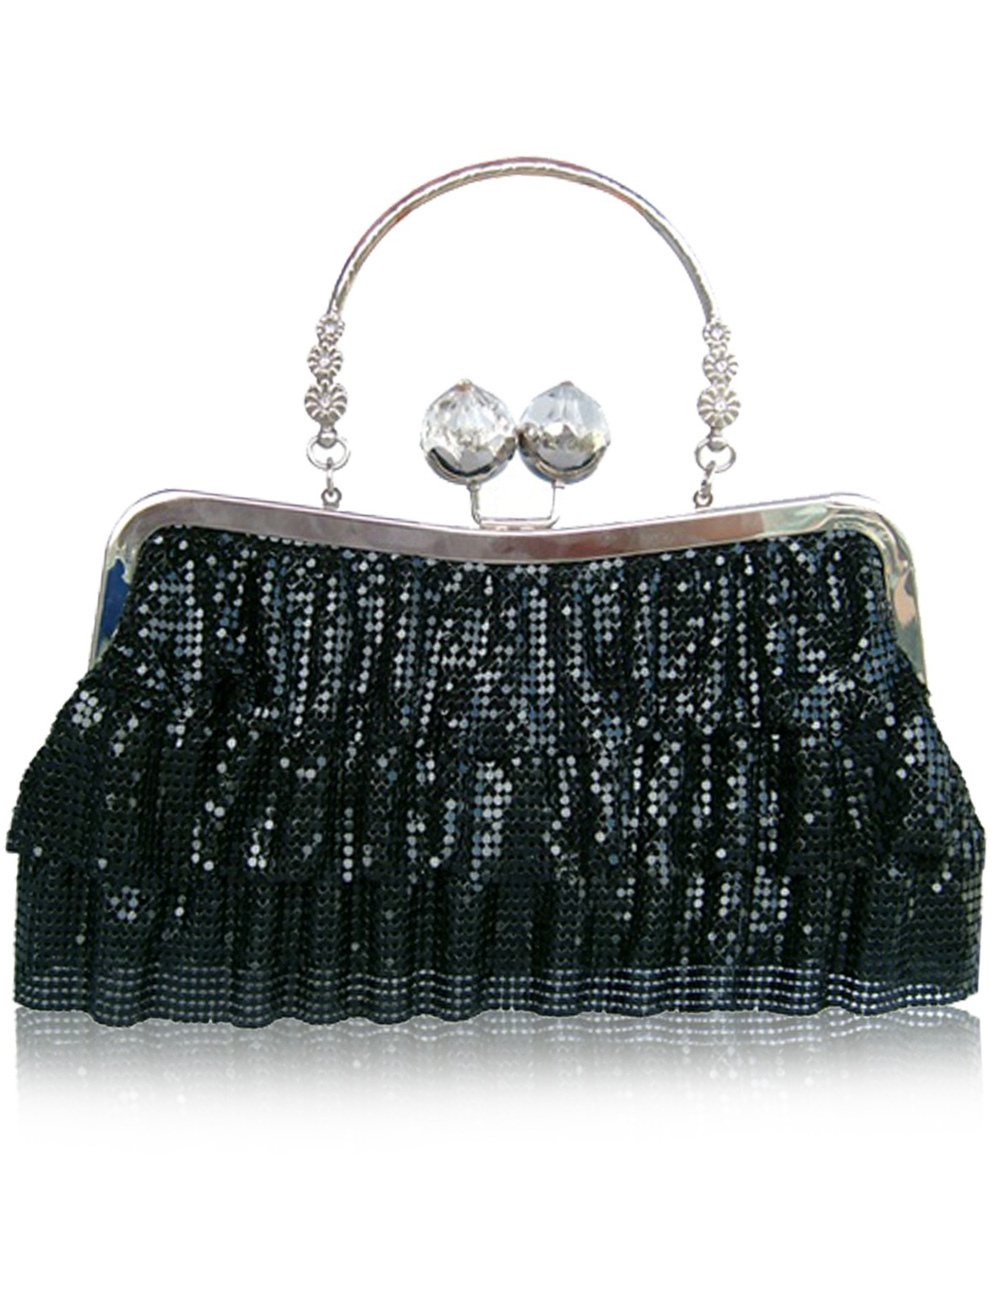 Vintage Metallic Sequined Rhinestone Woman's Evening Bag